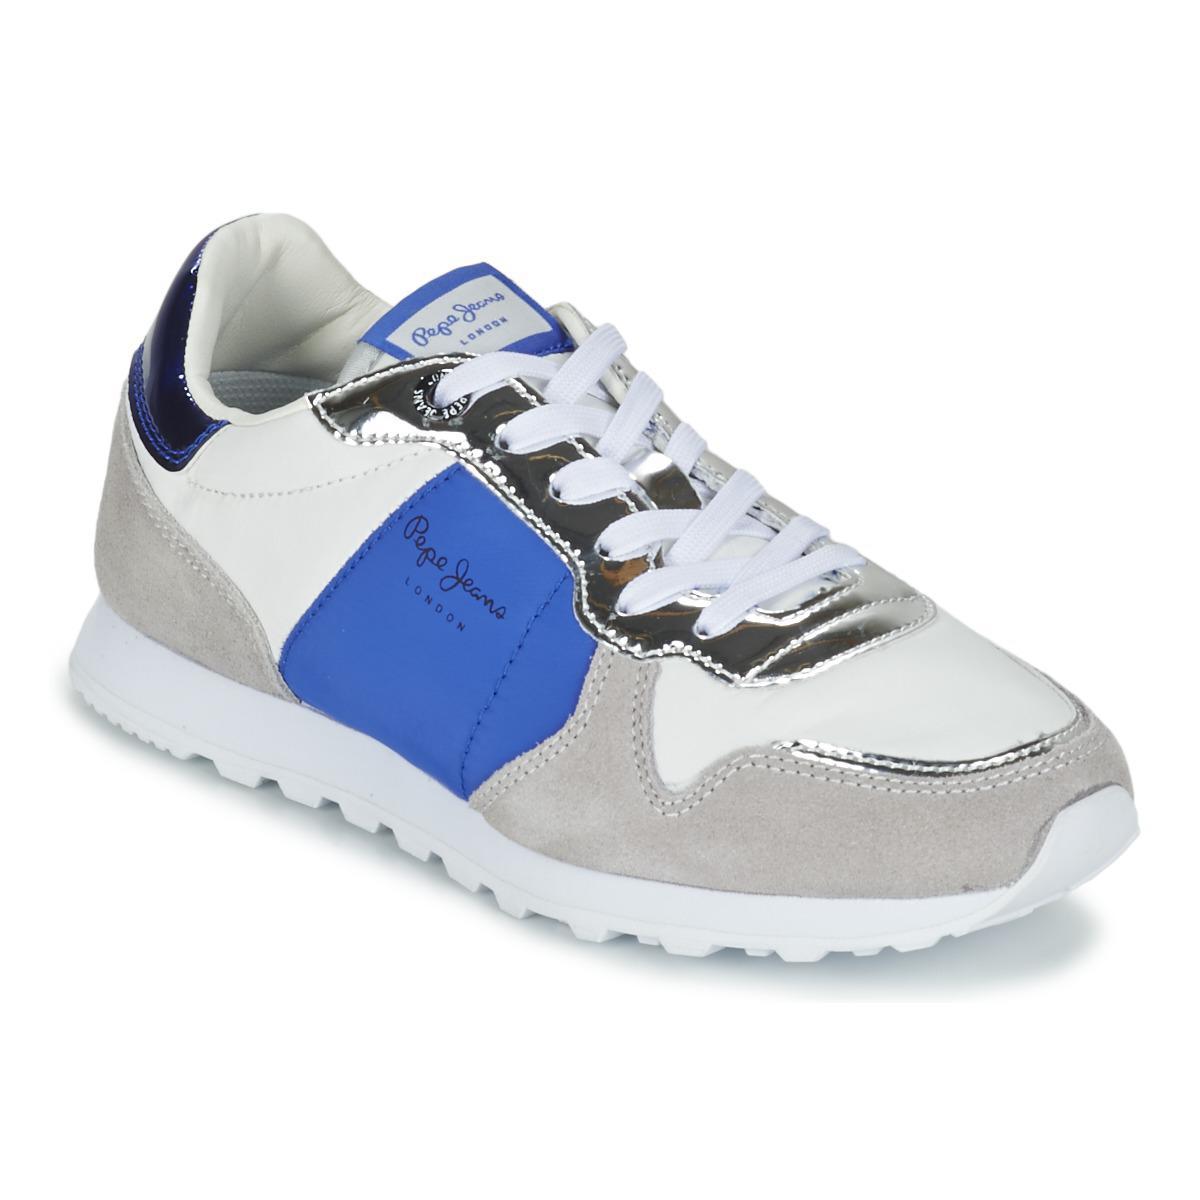 Pepe Jeans Damen Verona W New Mirrow Sneakers